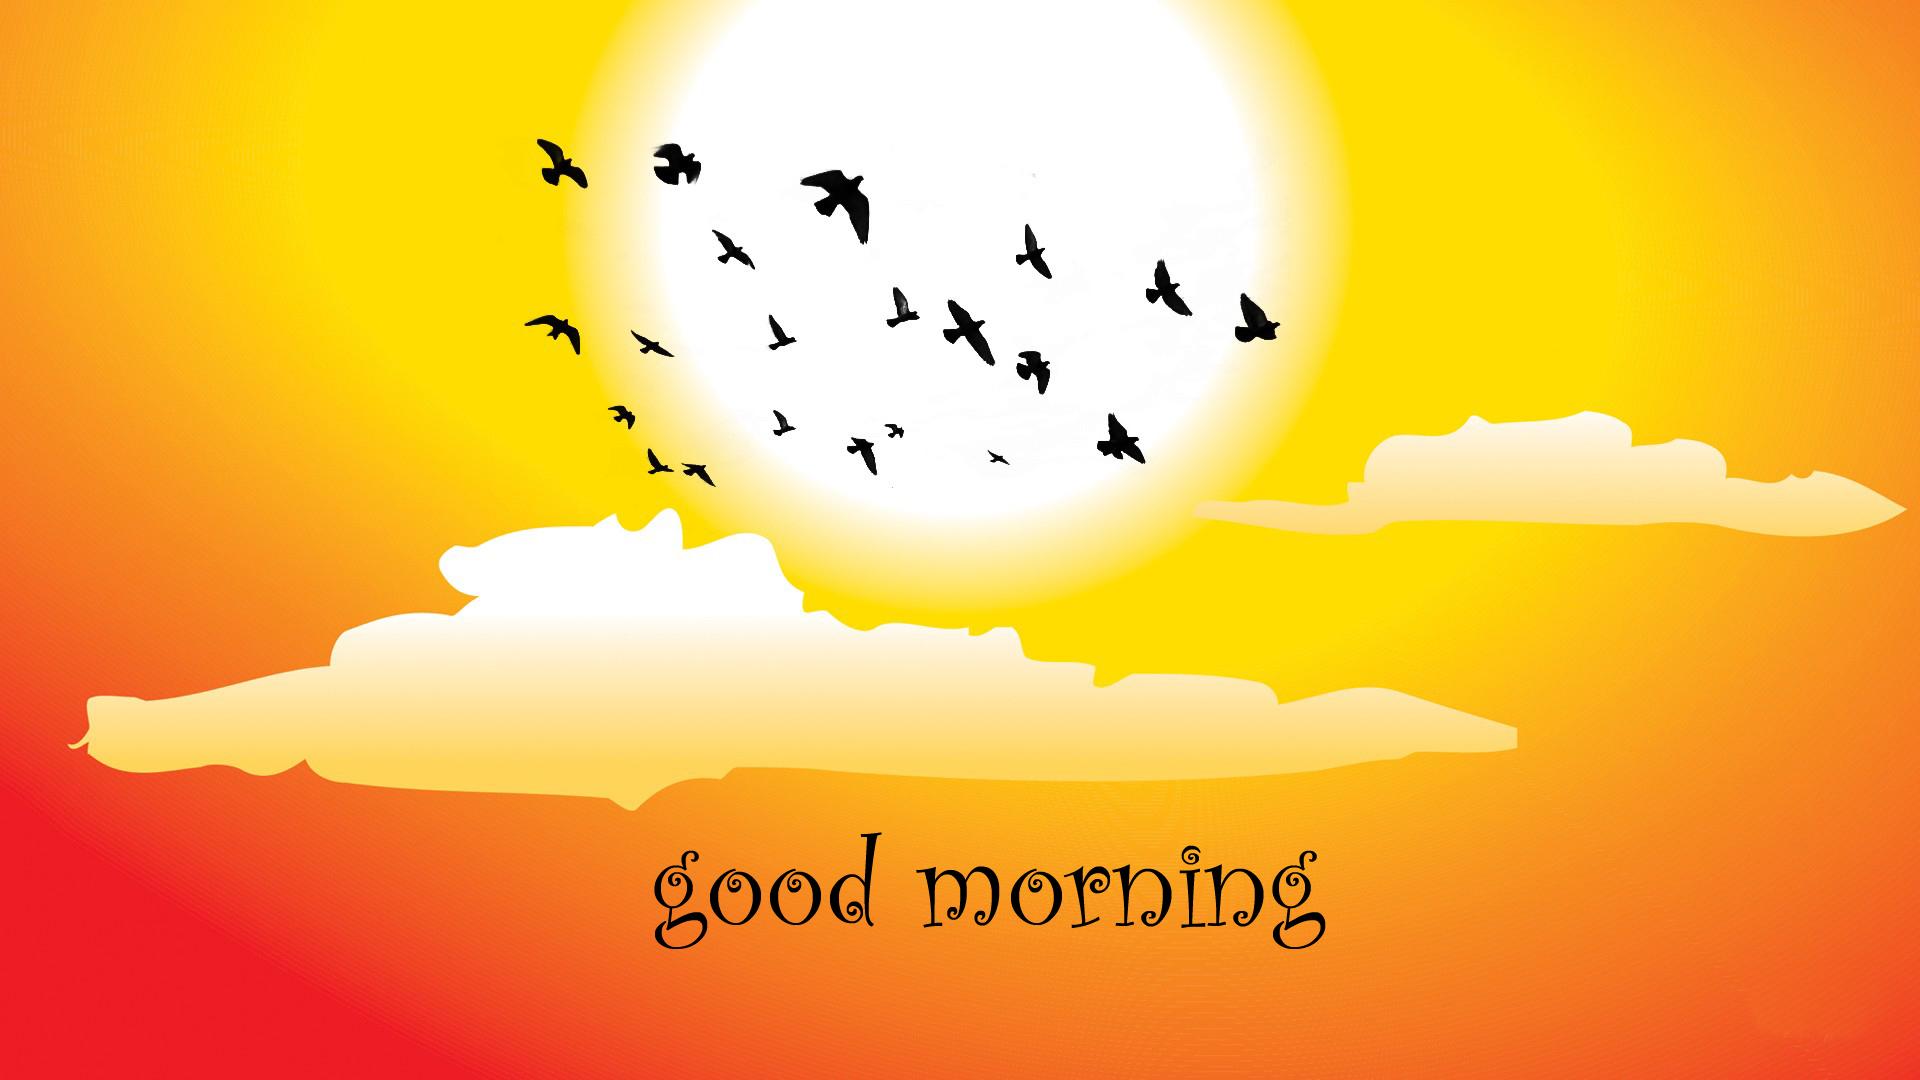 good morning image | hd wallpapers pulse